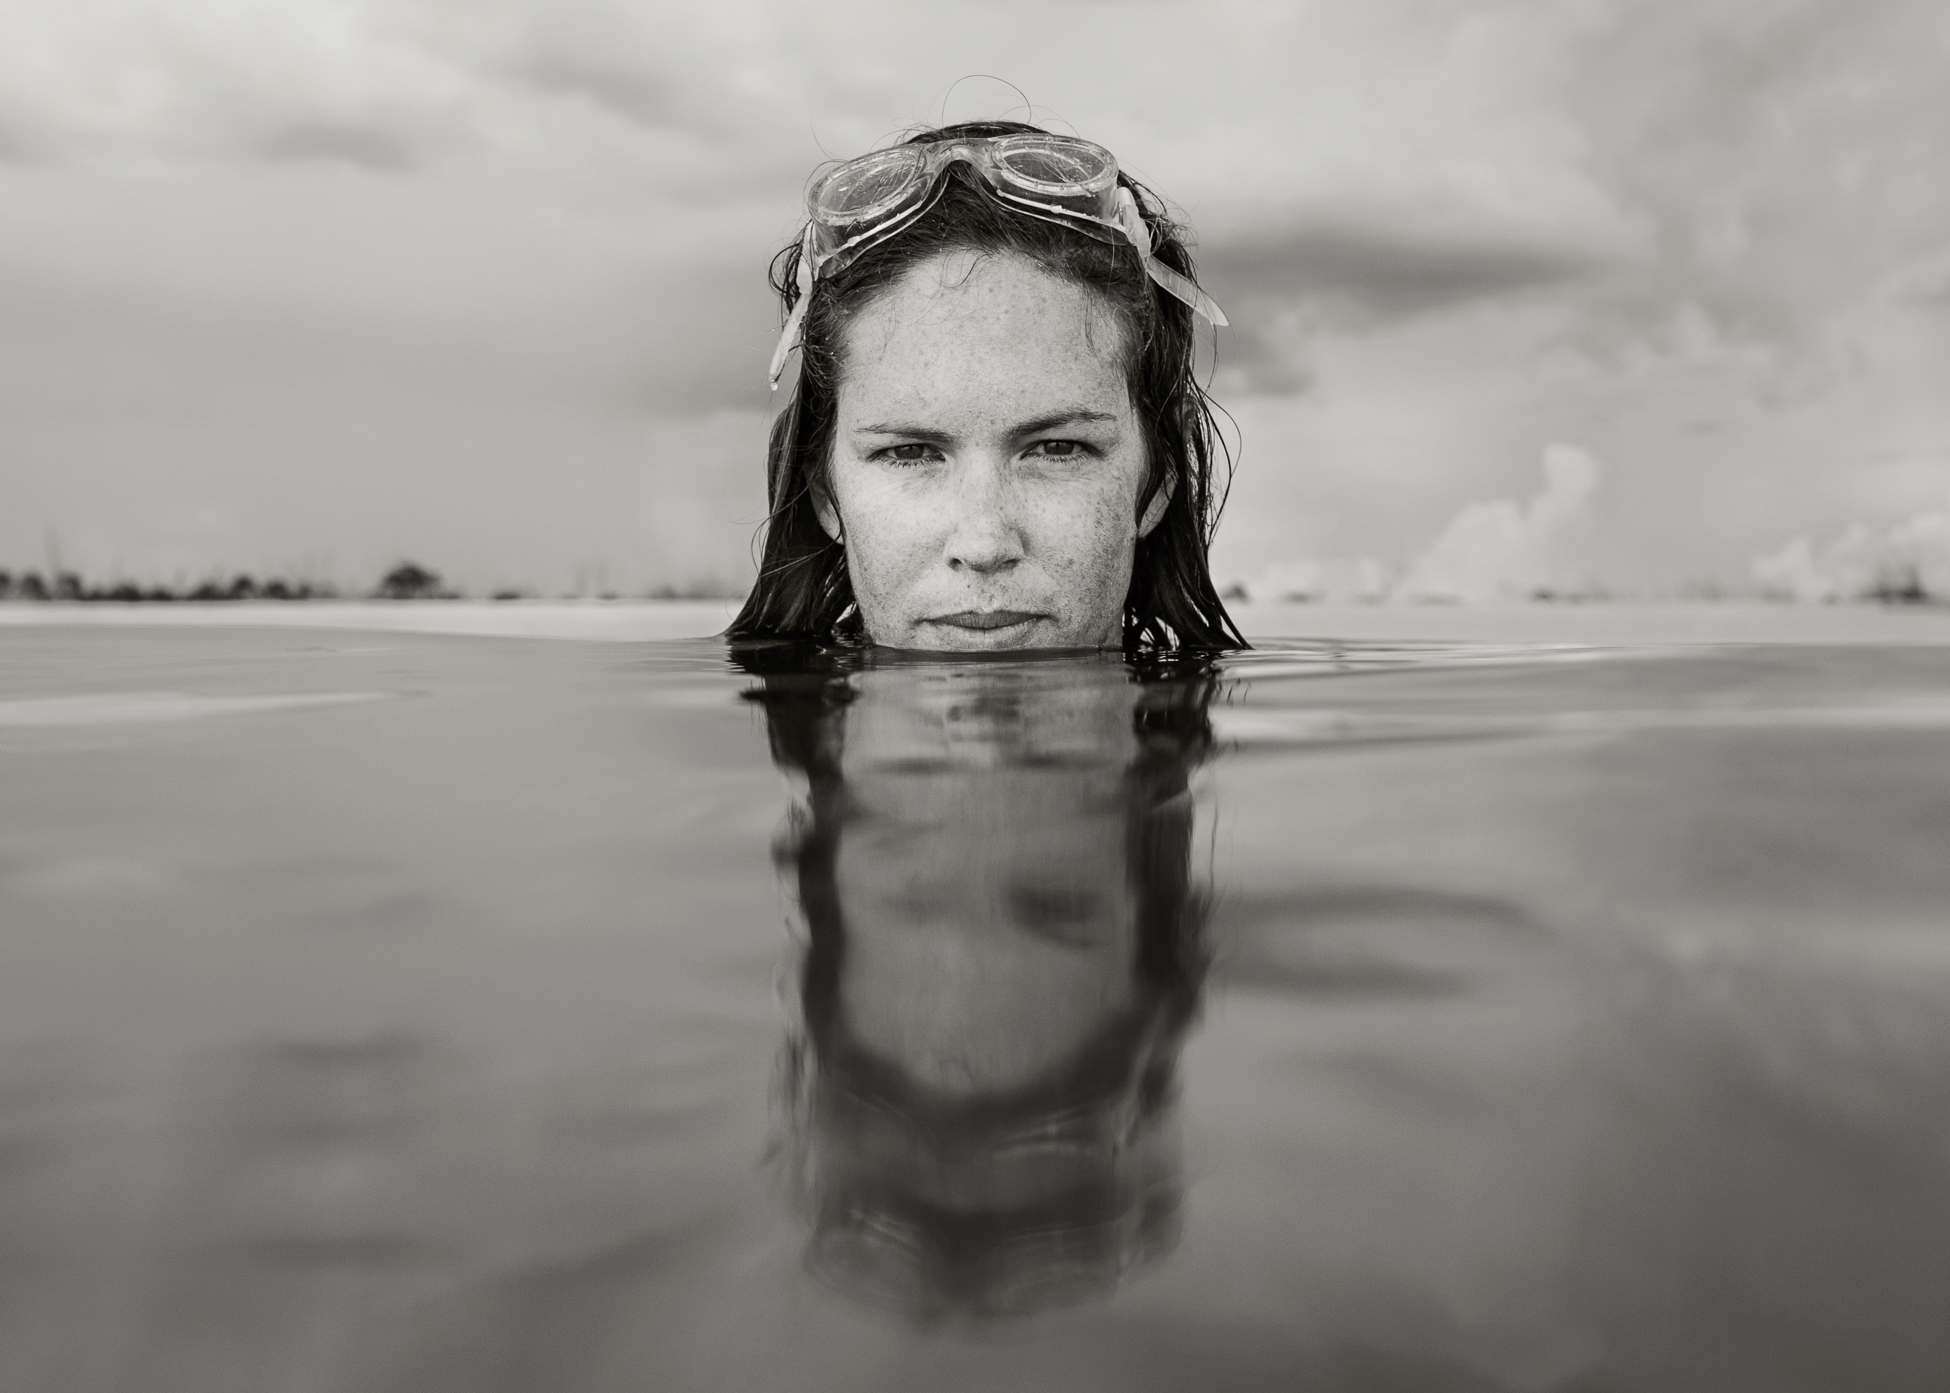 Heather, Florida, 2012